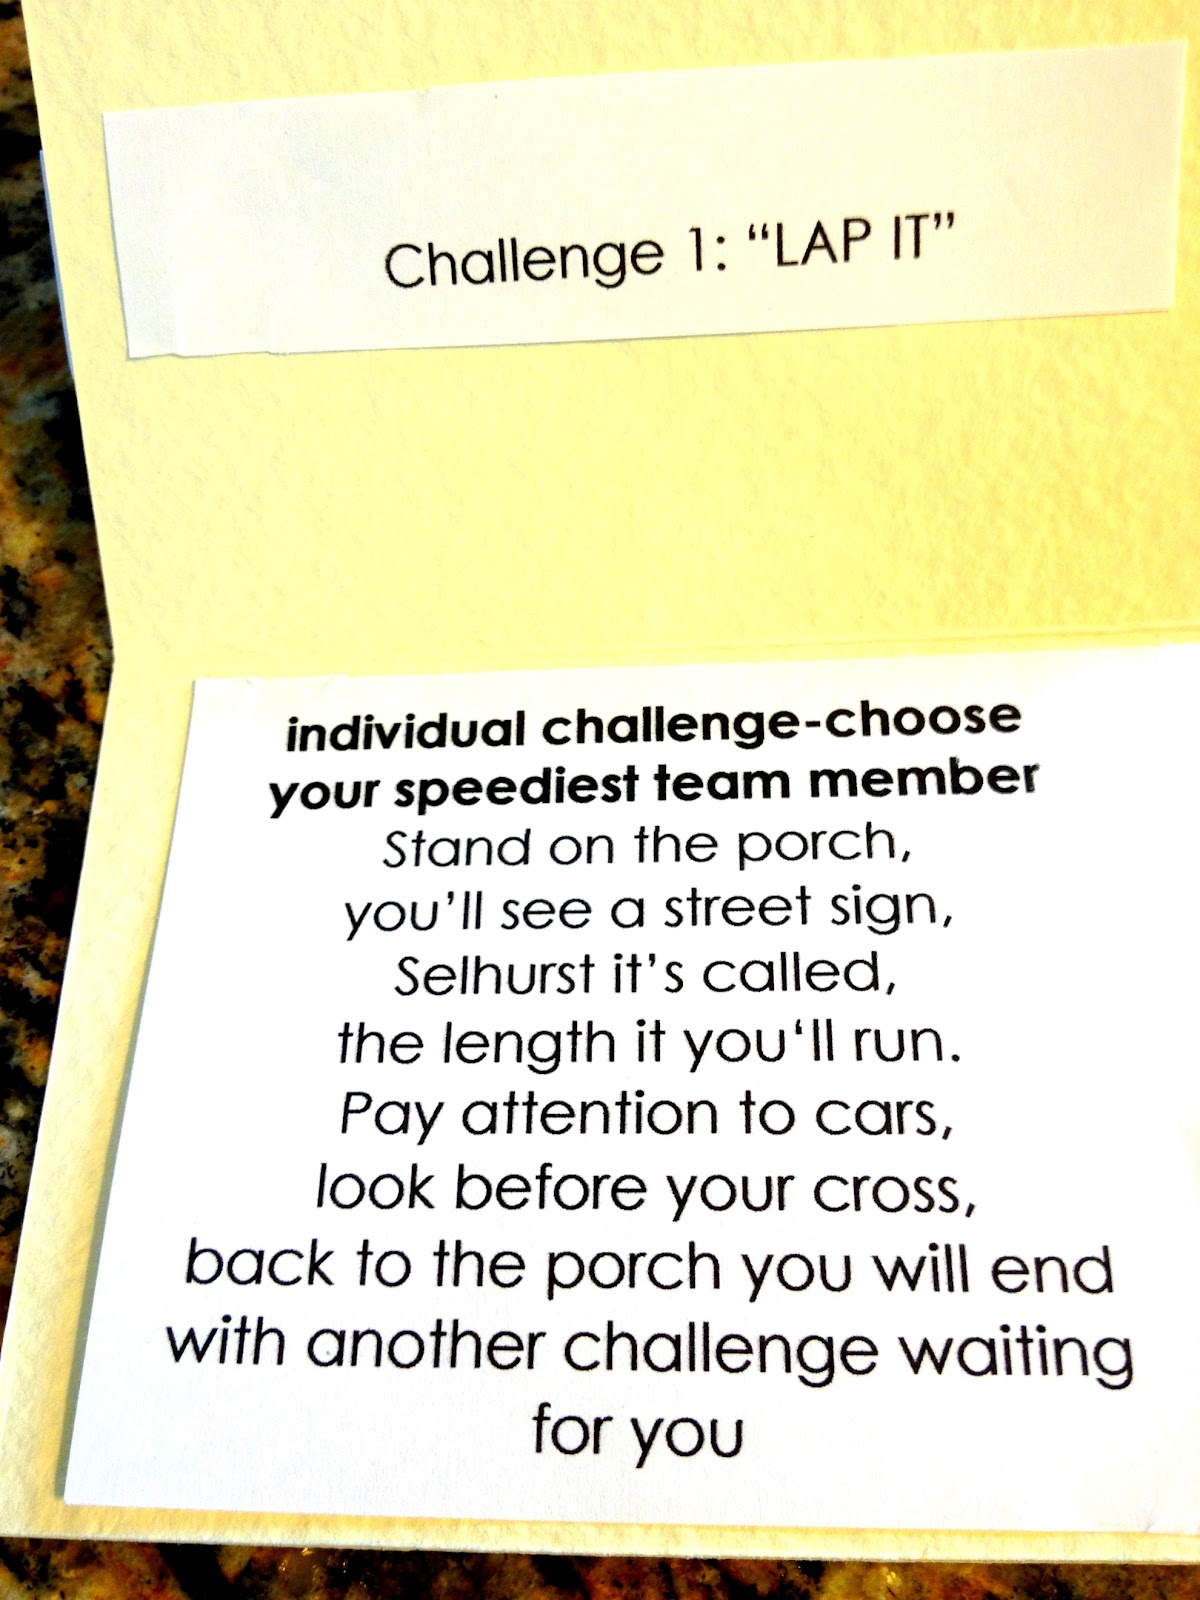 Amazing race ideas -  Lap It